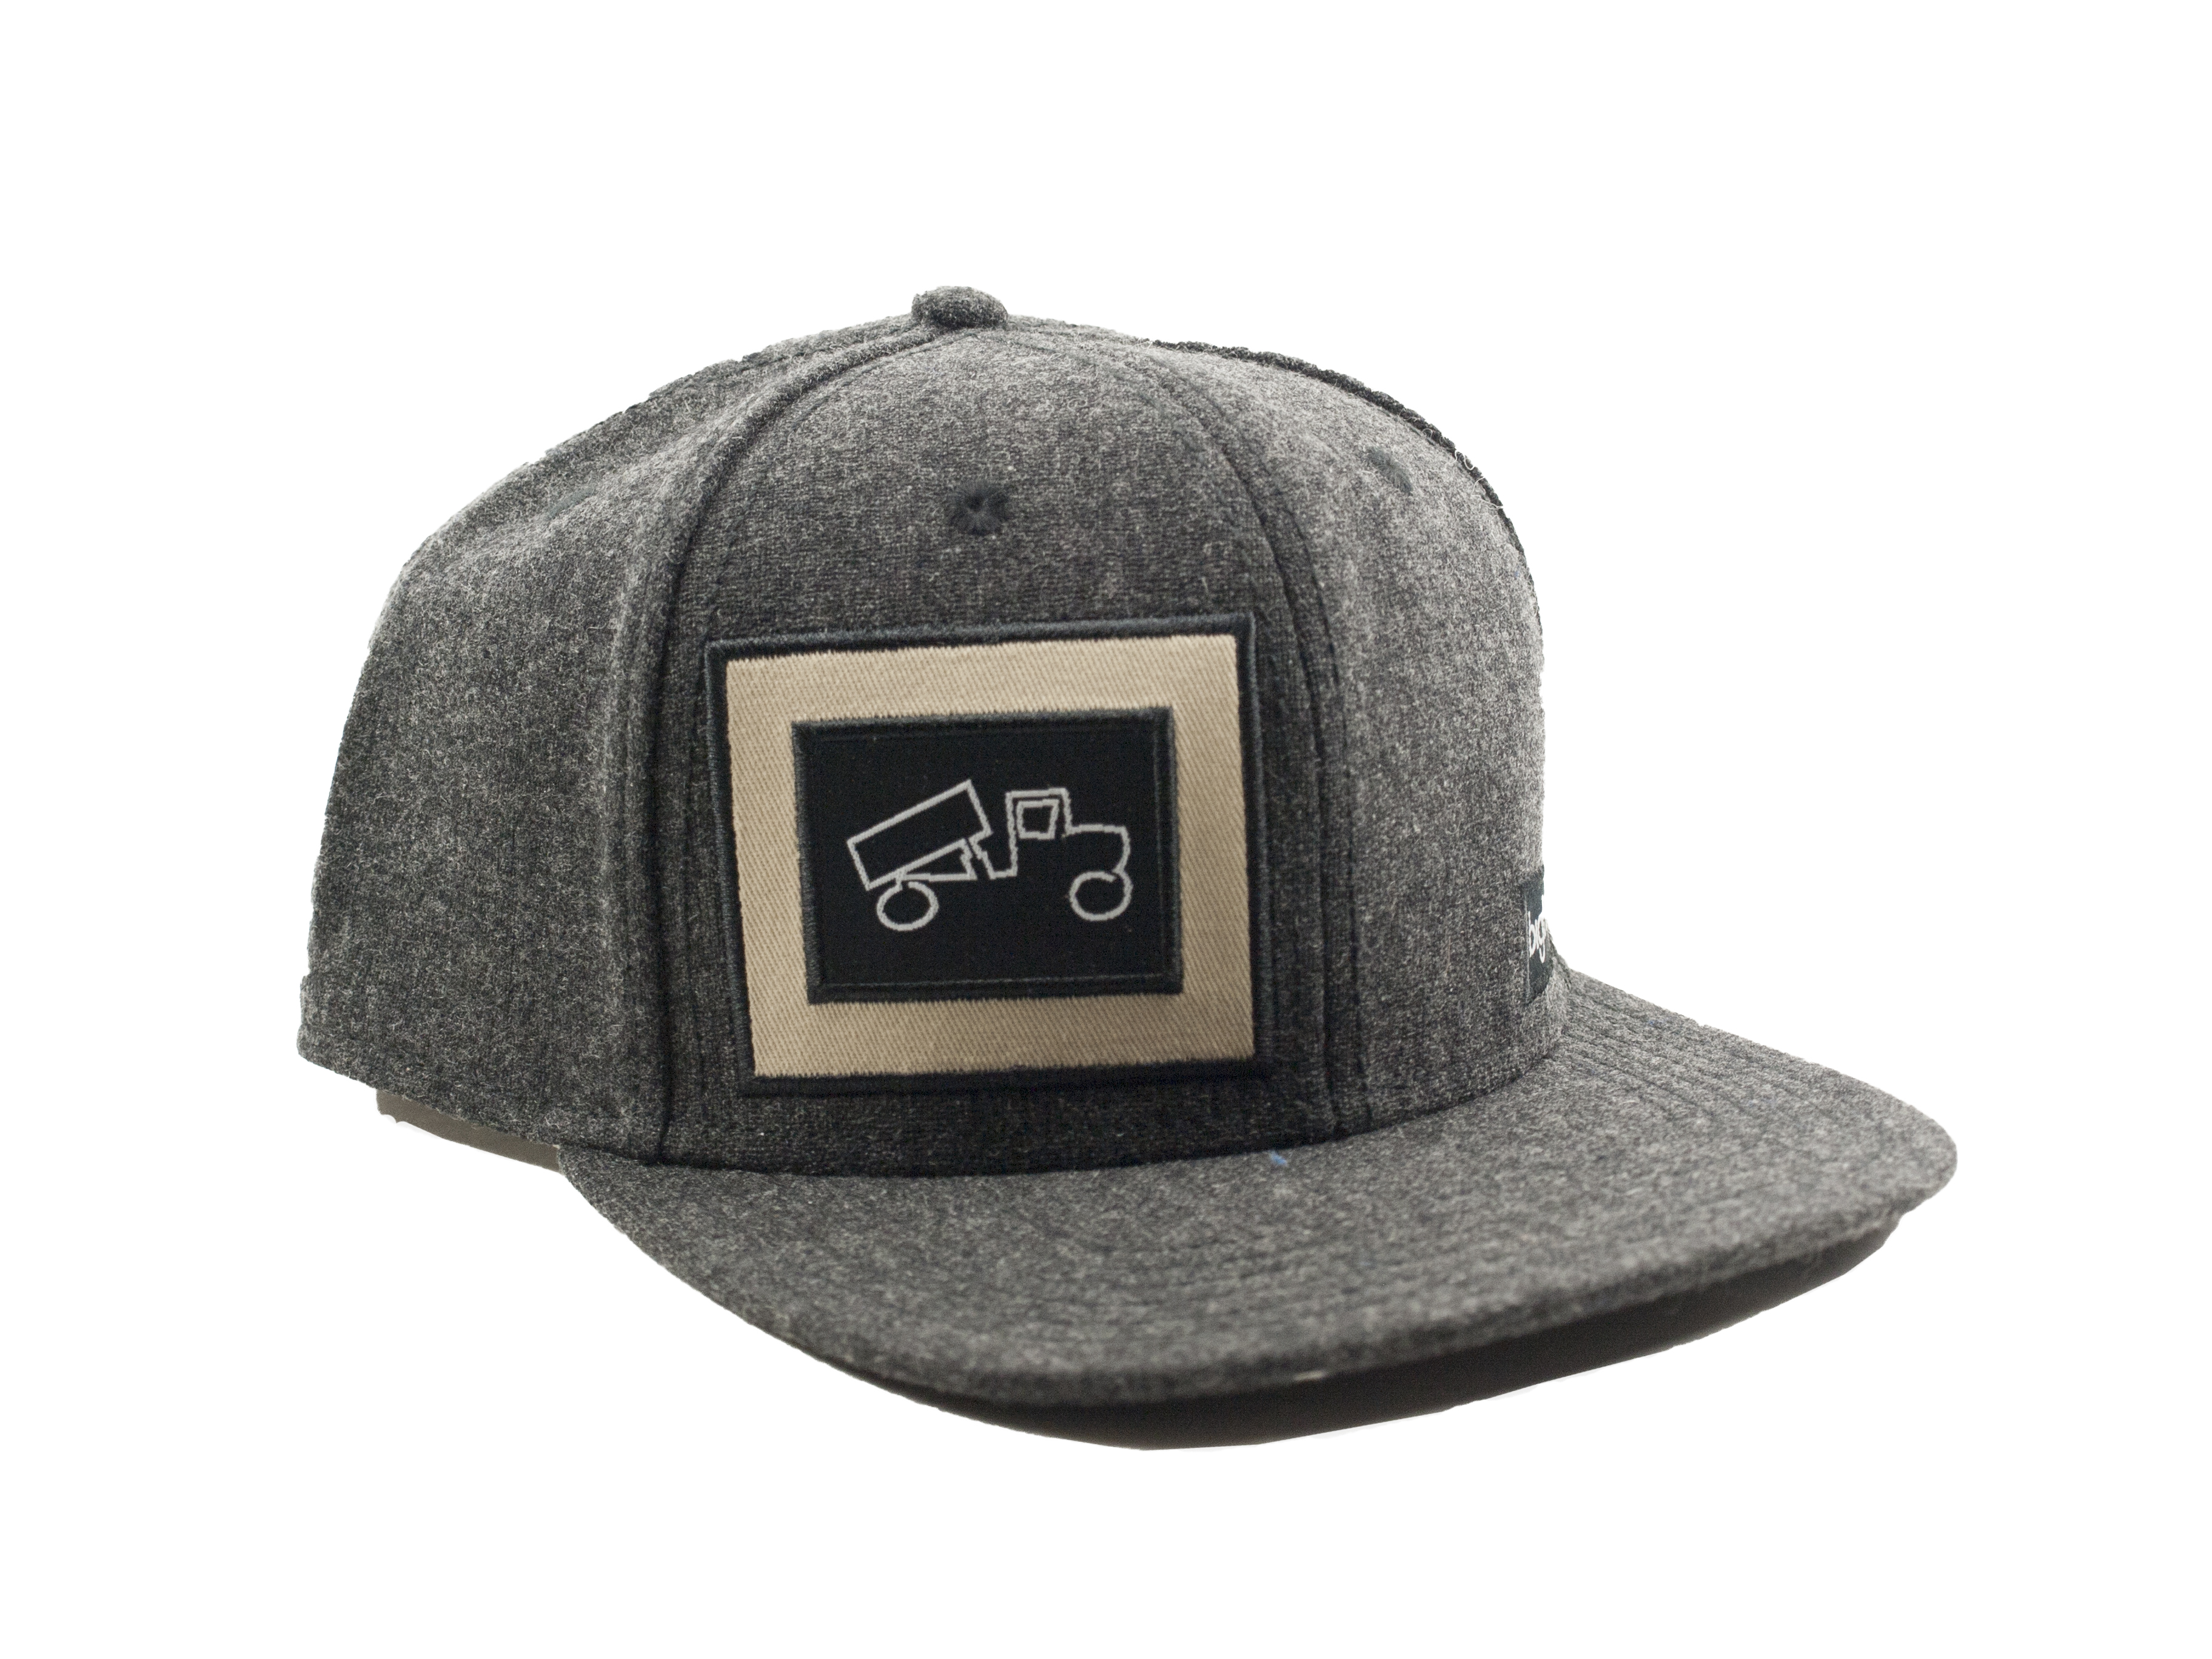 Pro line Ull dark grey